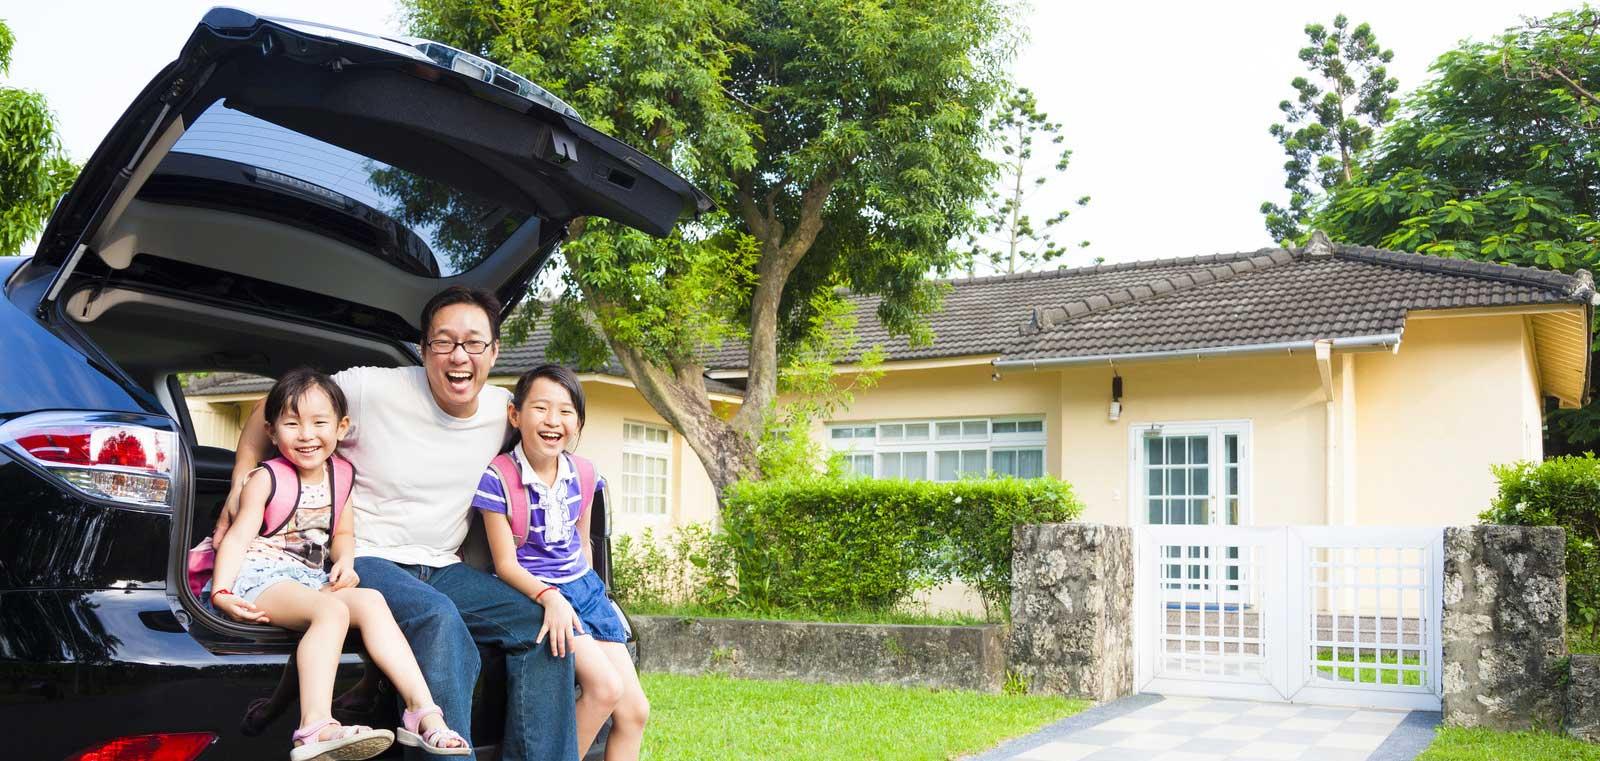 pfg-home-mortgage-rates